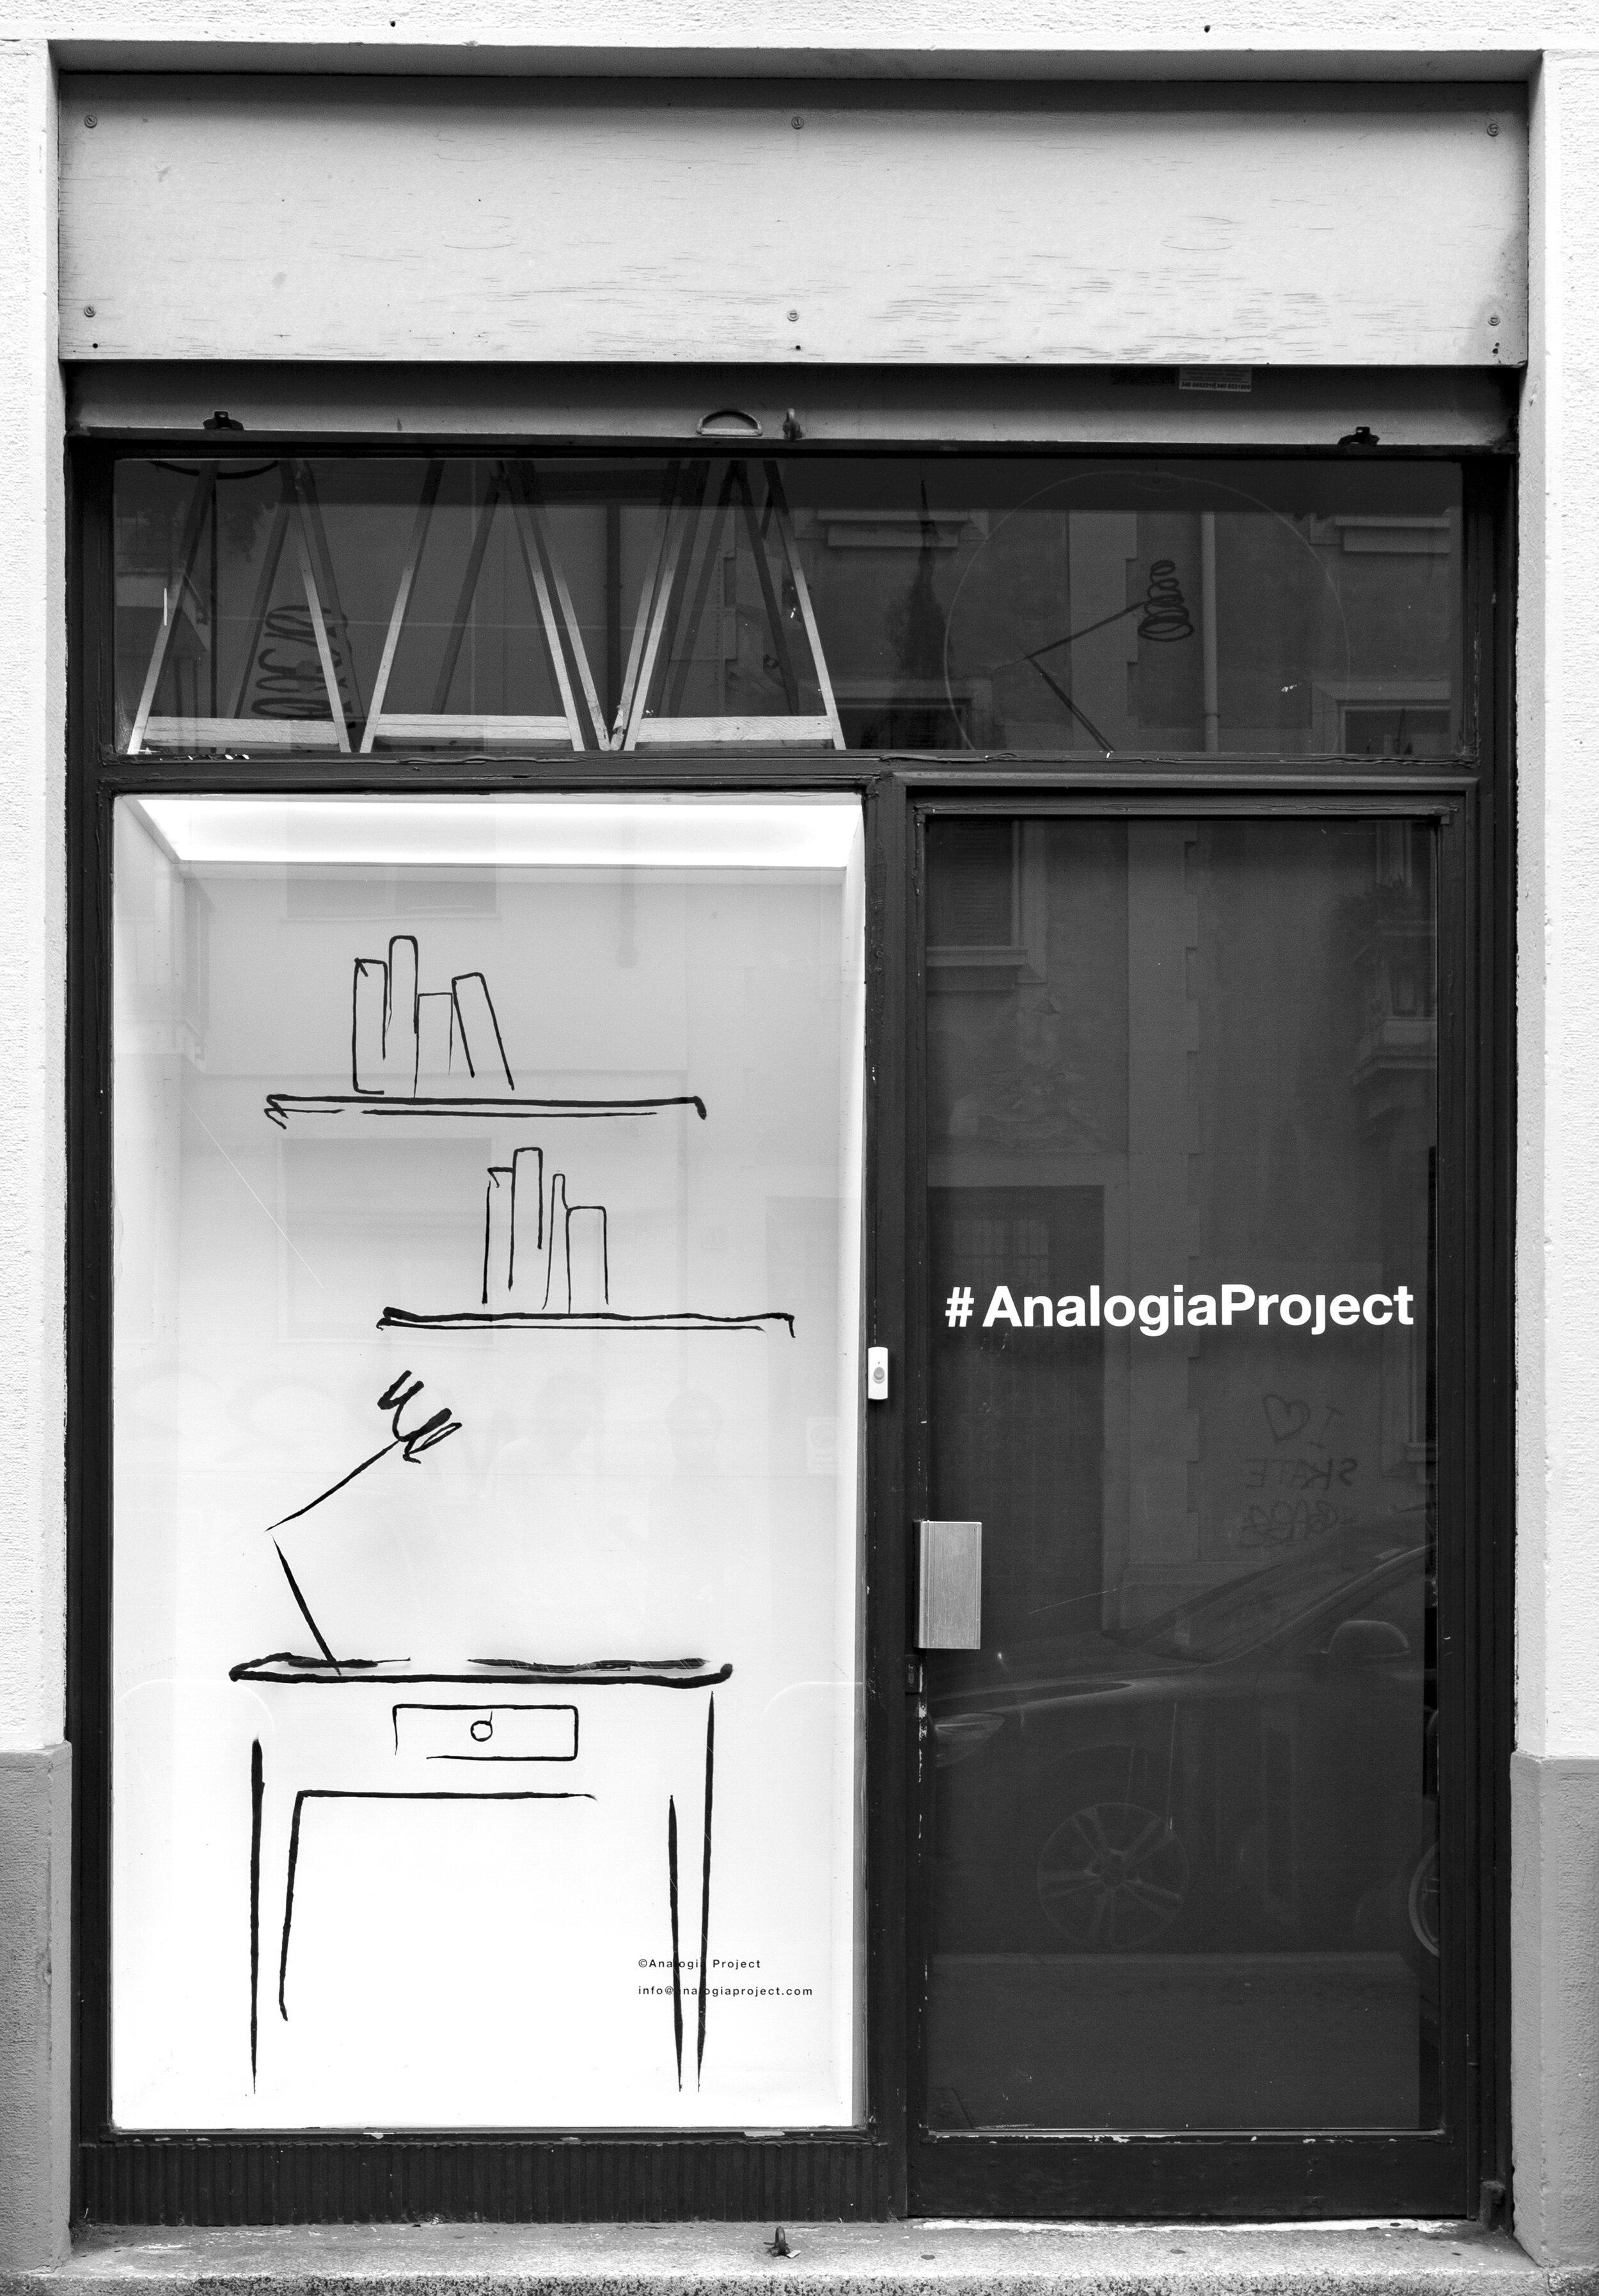 AP_Window display1_BW_2019.jpg